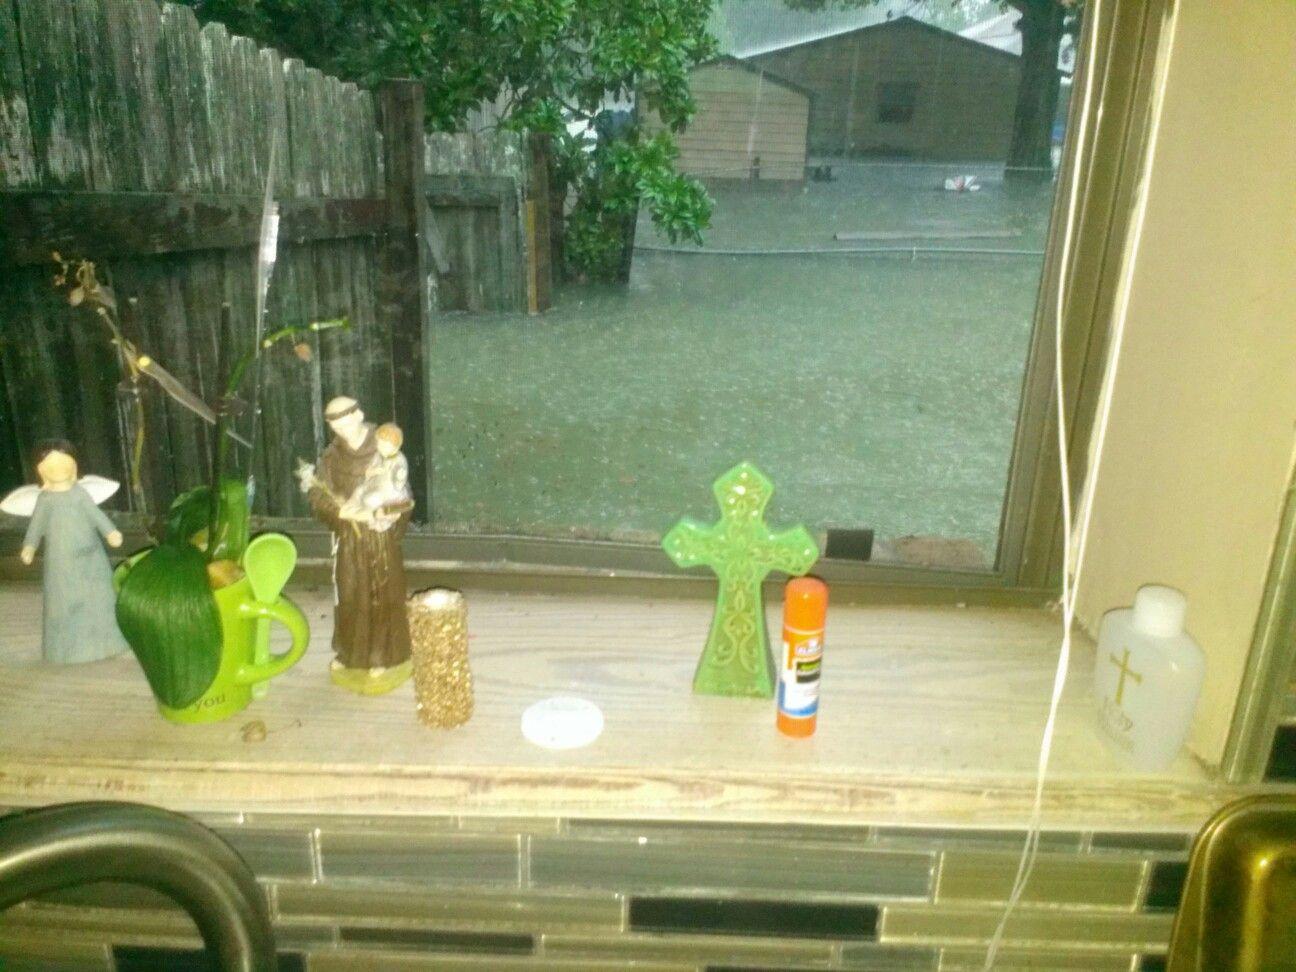 Louisiana flood 2016 #Louisianastrong